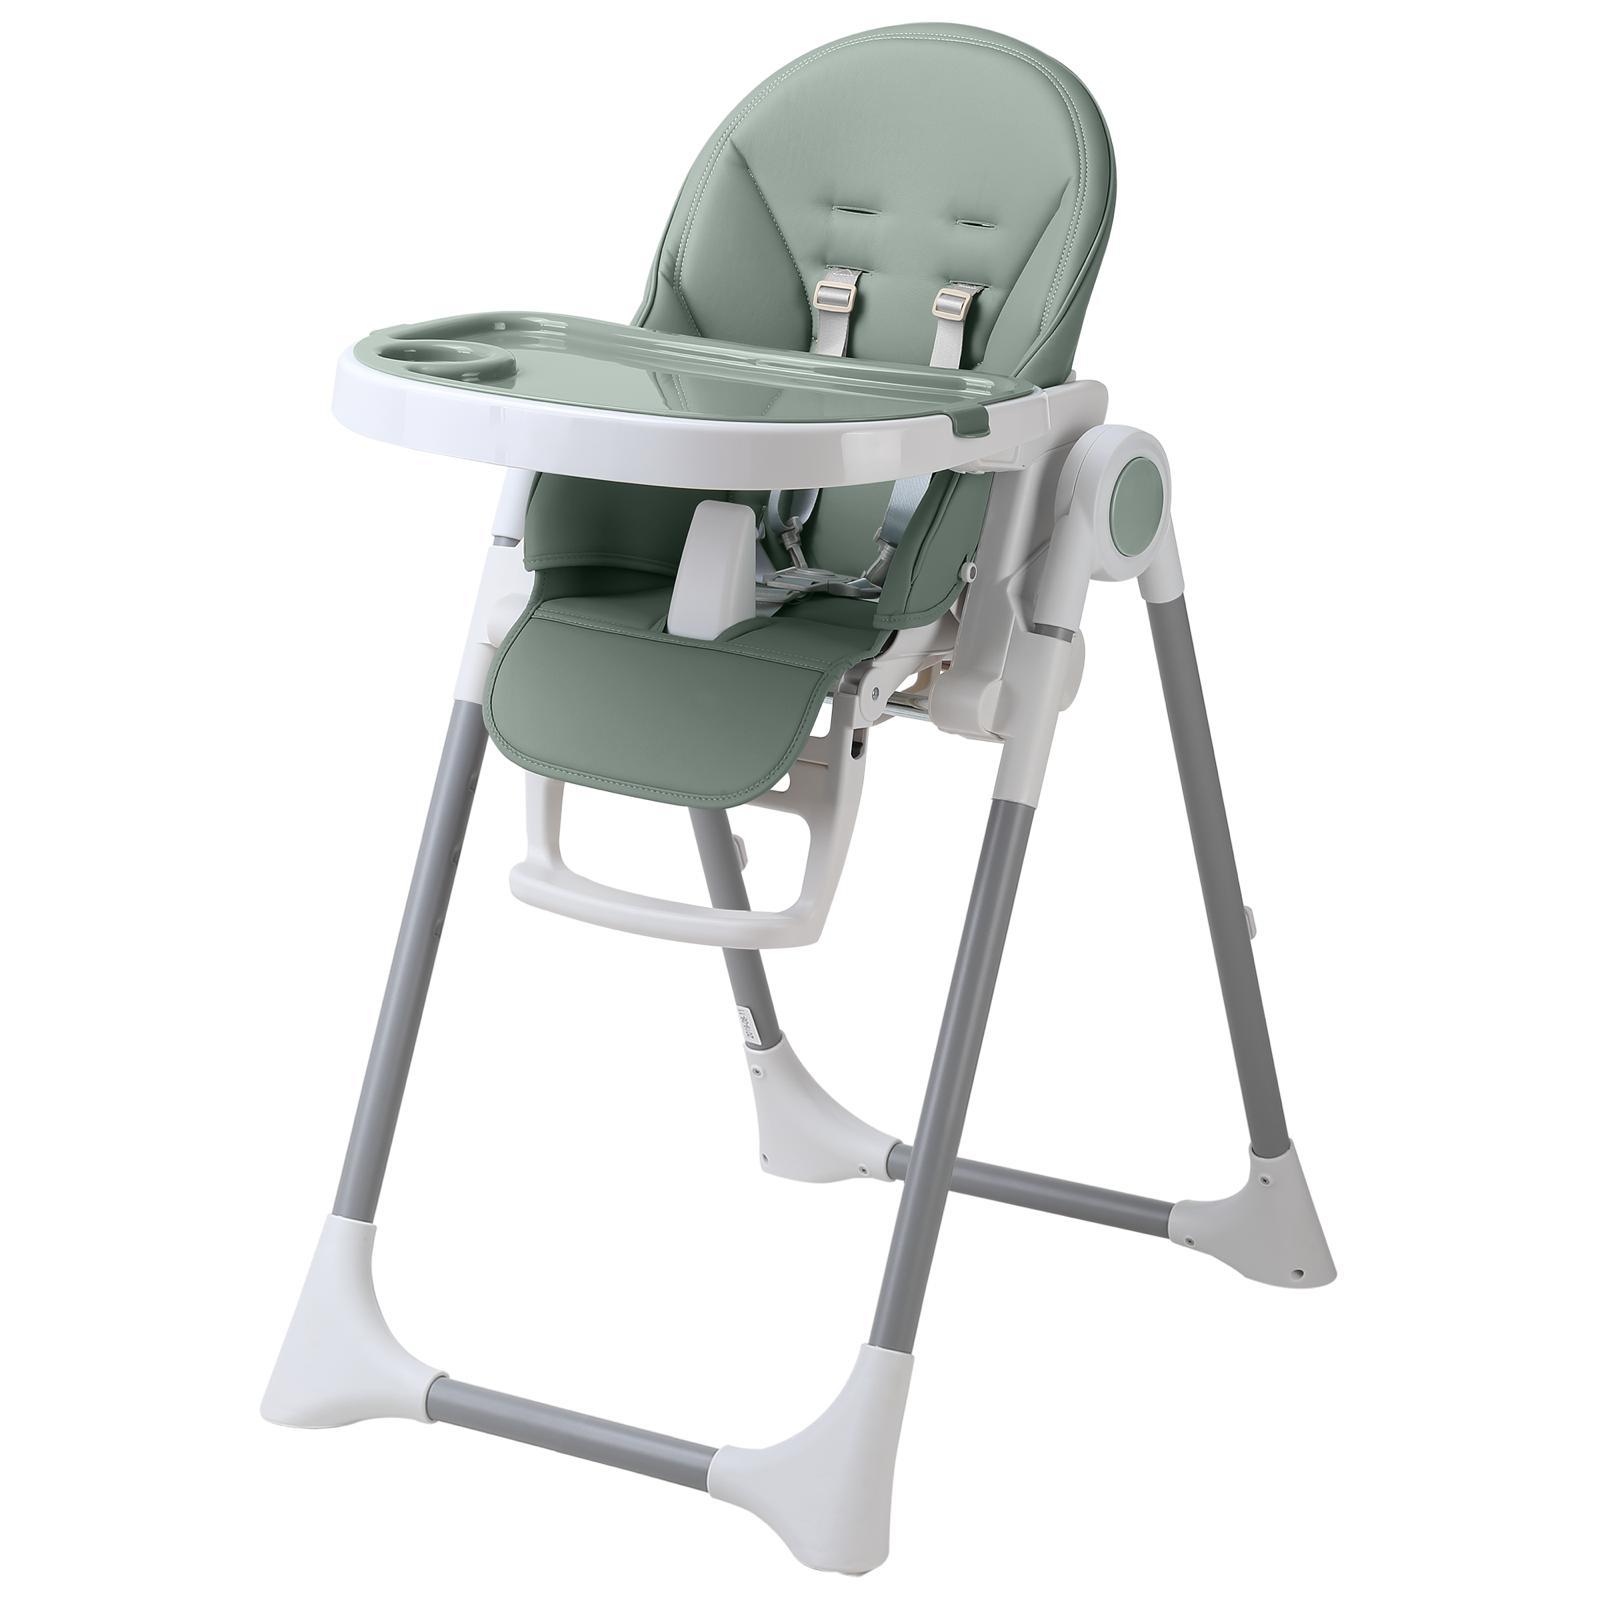 כיסא אוכל אינפנטי Infanti